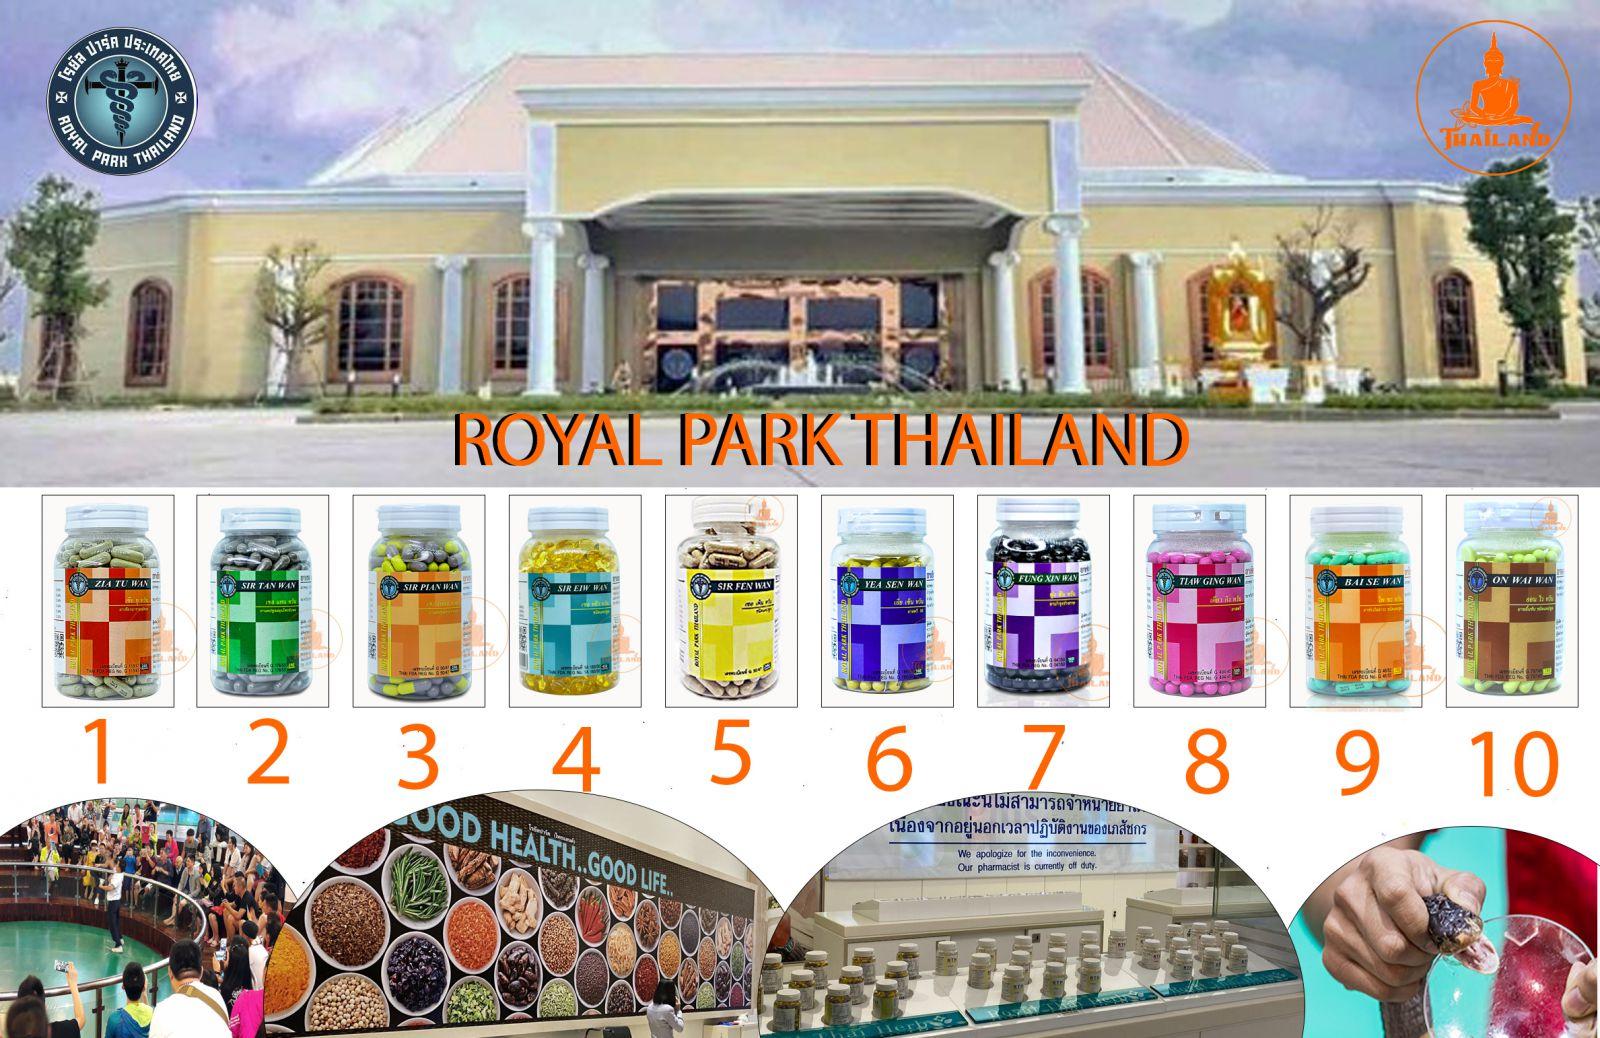 zia tu wan thuốc rắn thái lan số 1 từ royal park thailand